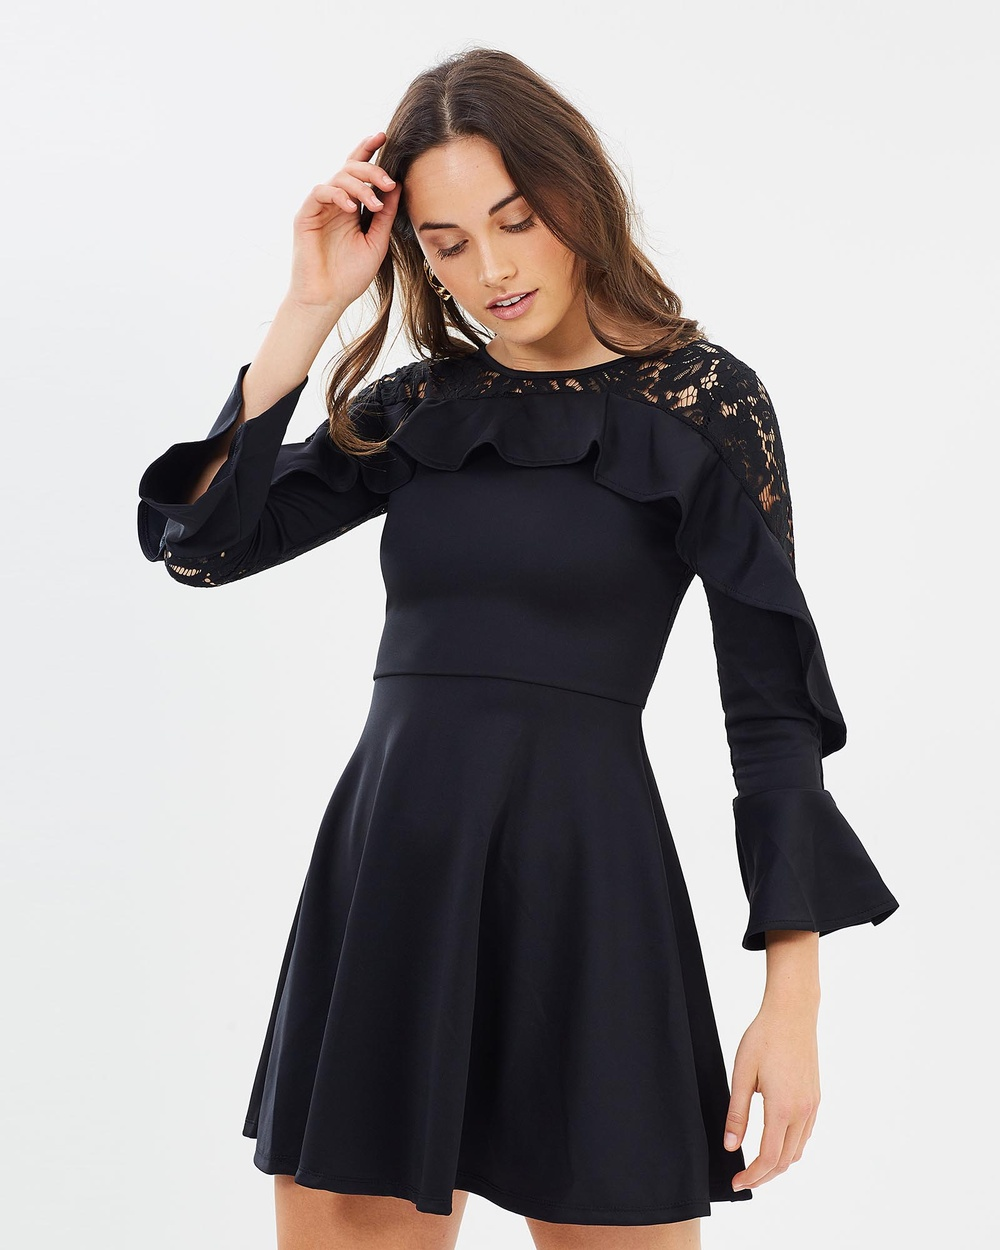 ROXCIIS Mica Cocktail Dress Dresses Black Mica Cocktail Dress